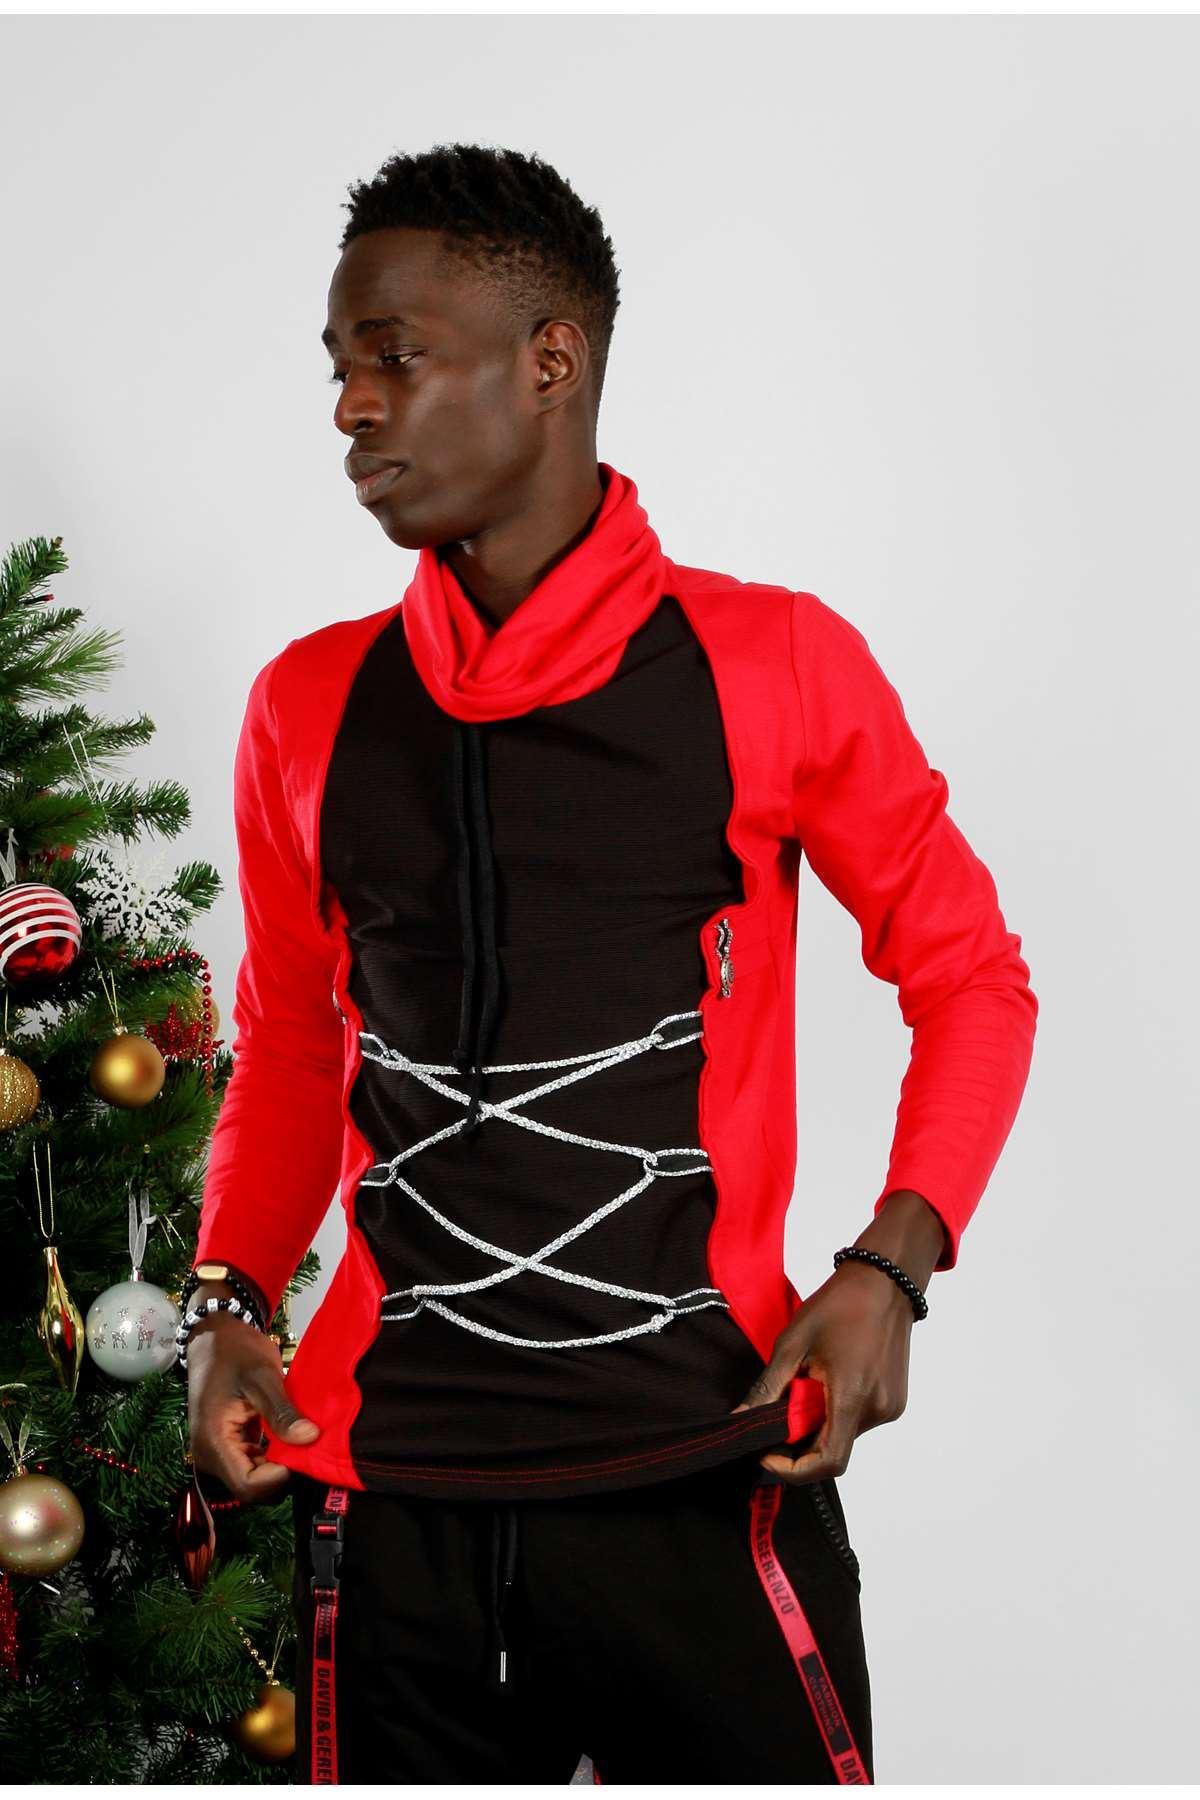 Önü İpli Boğazlı Tarz Sweatshirt Kırmızı